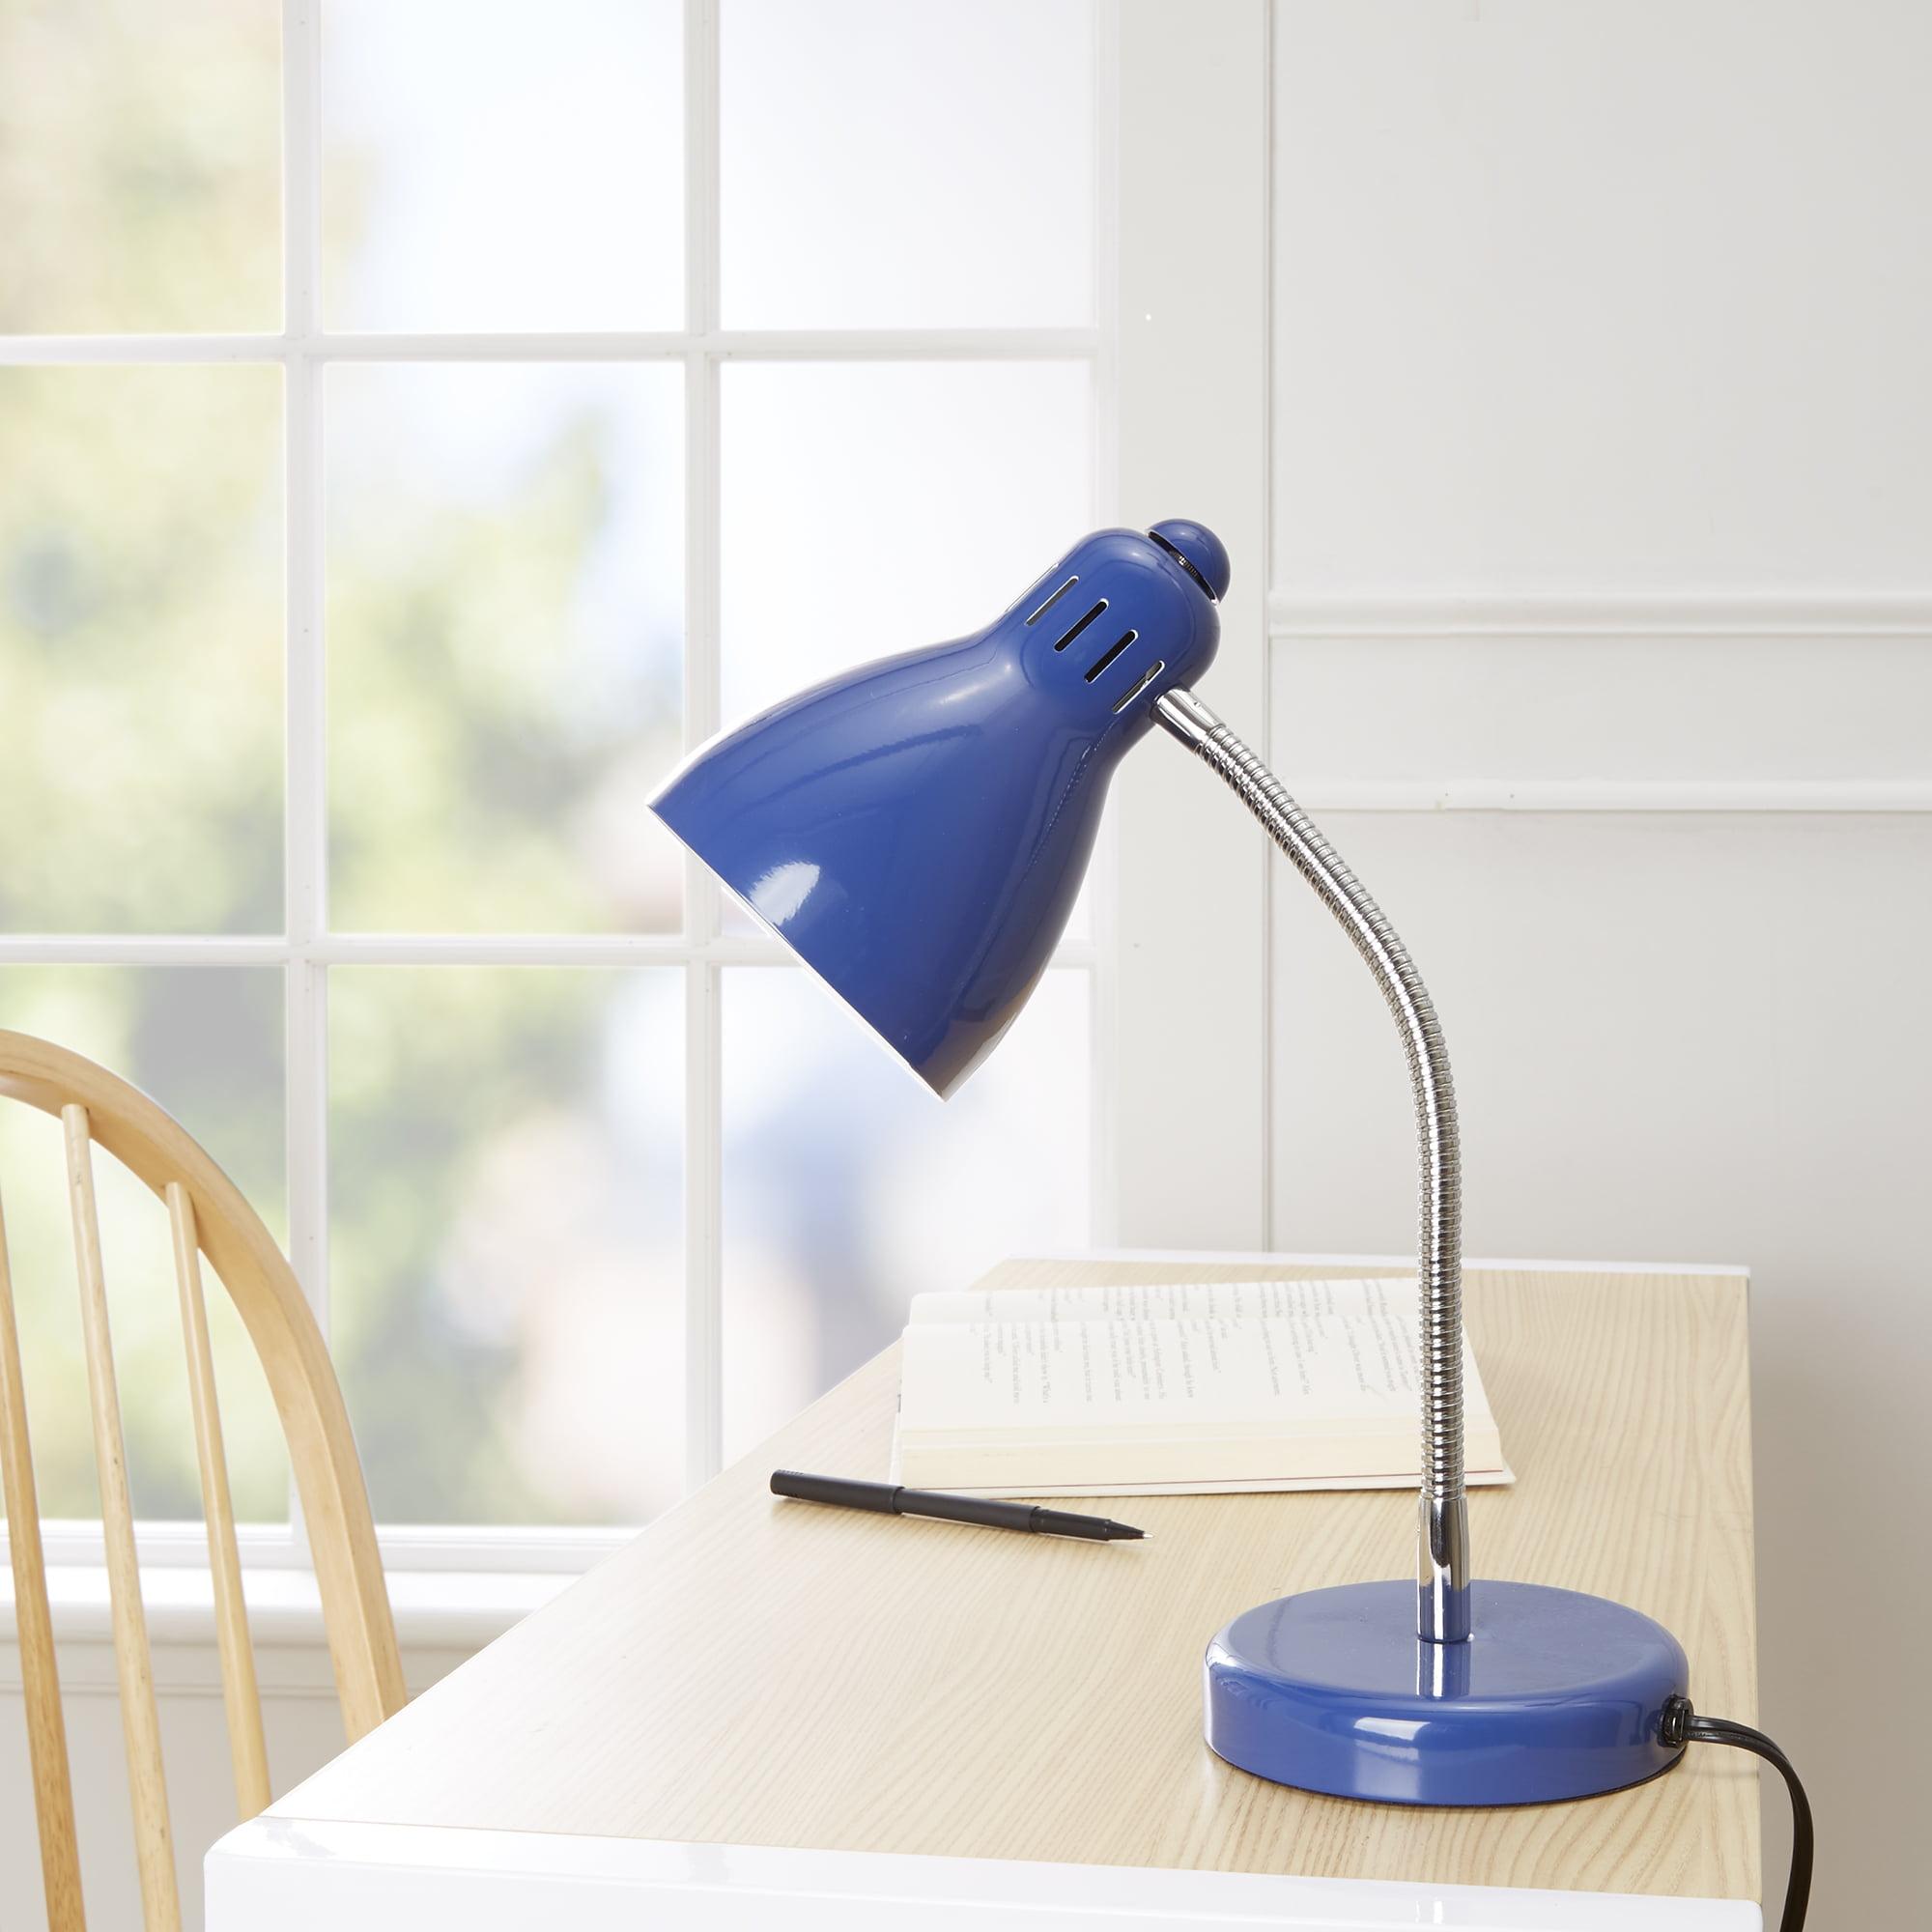 Mainstays Stadium Blue Desk Lamp, CFL Bulb Included